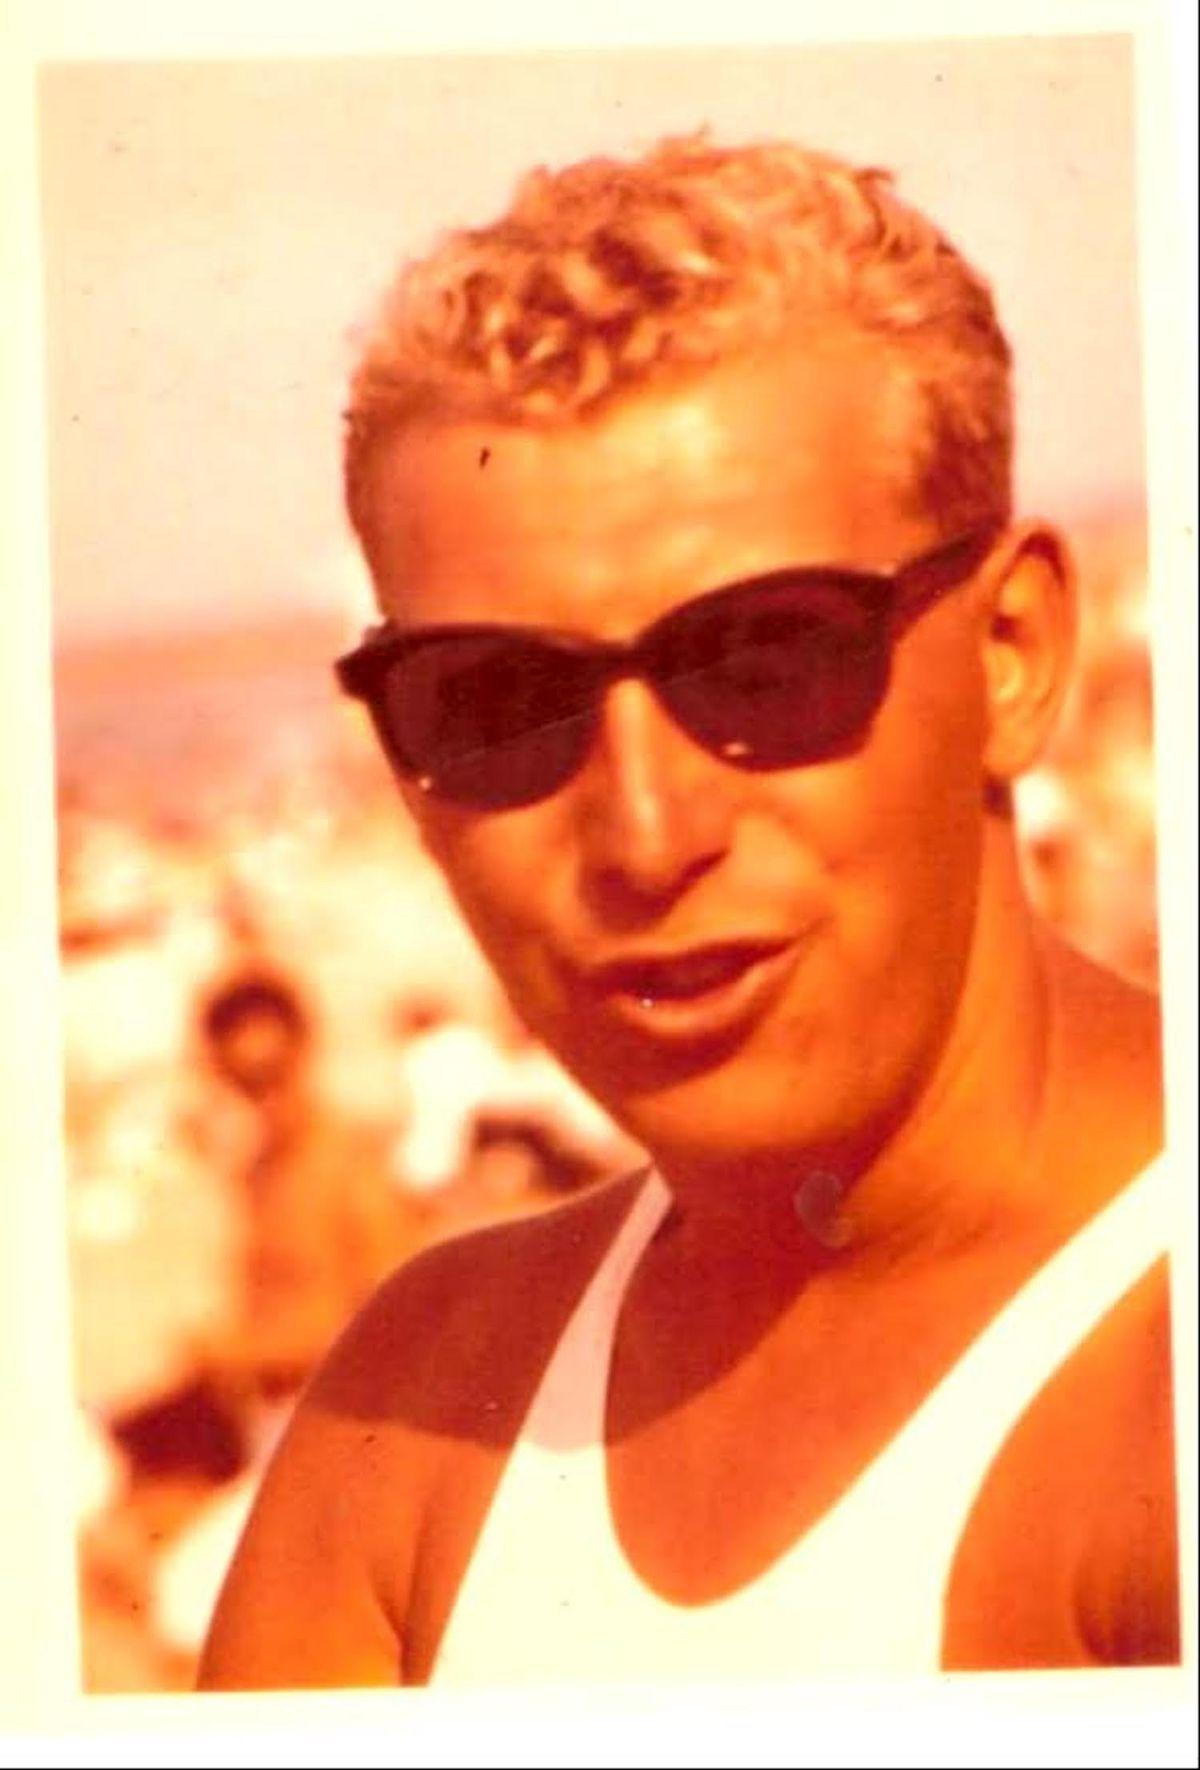 Joe Pecoraro, then about 25, wearing his lifeguard captain jersey.